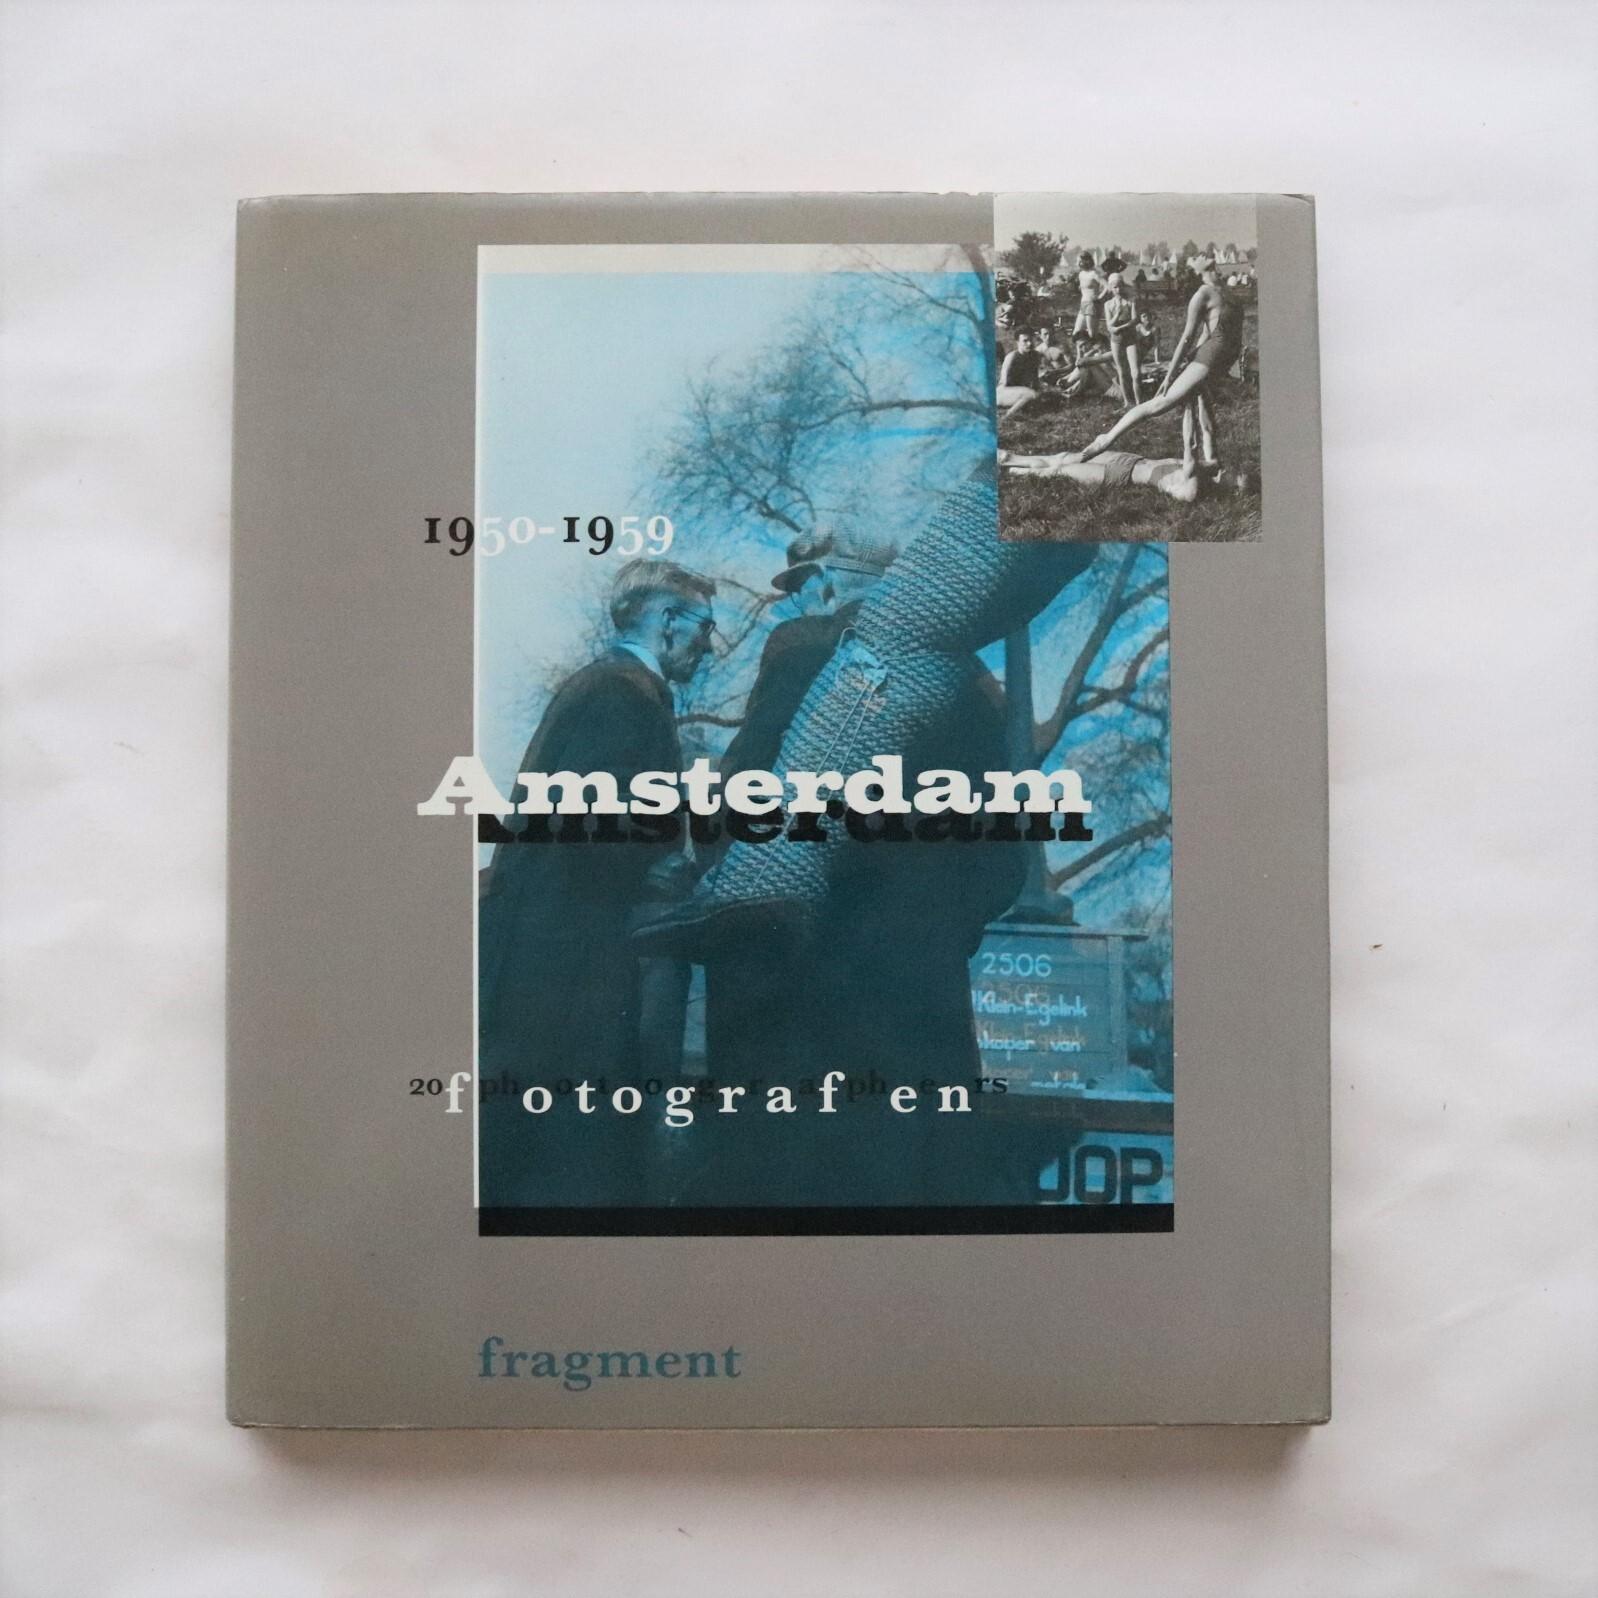 Amsterdam,1950-1959 : 20 fotografen